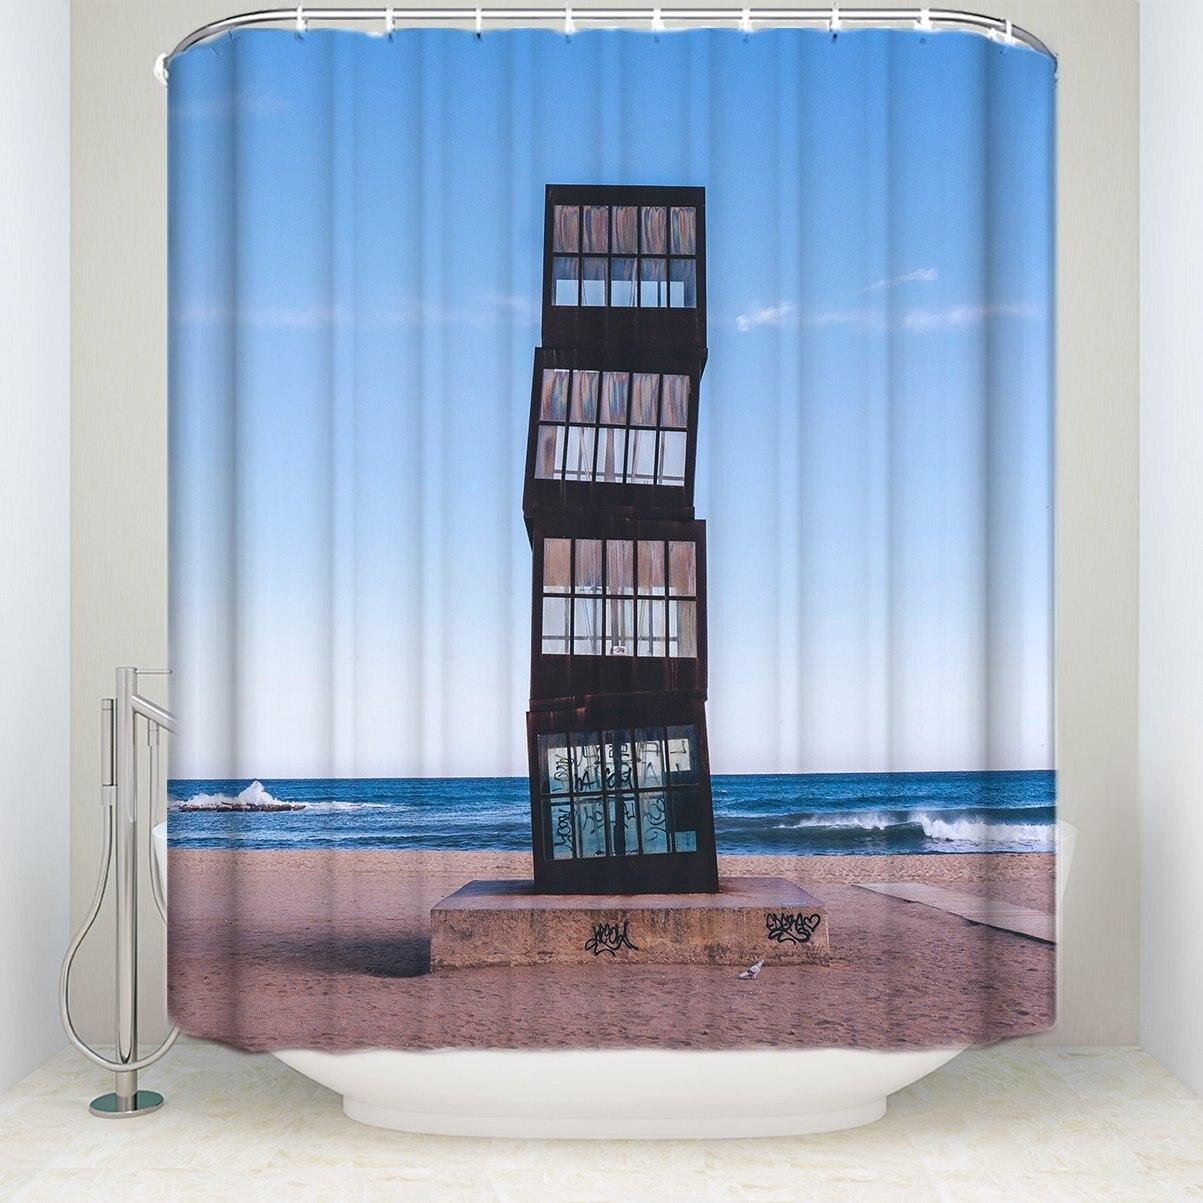 Unique Desgin Landscape Shower Curtain Buildding On The Beach Frabic And  Waterproof Bath Shower Curtain Bright